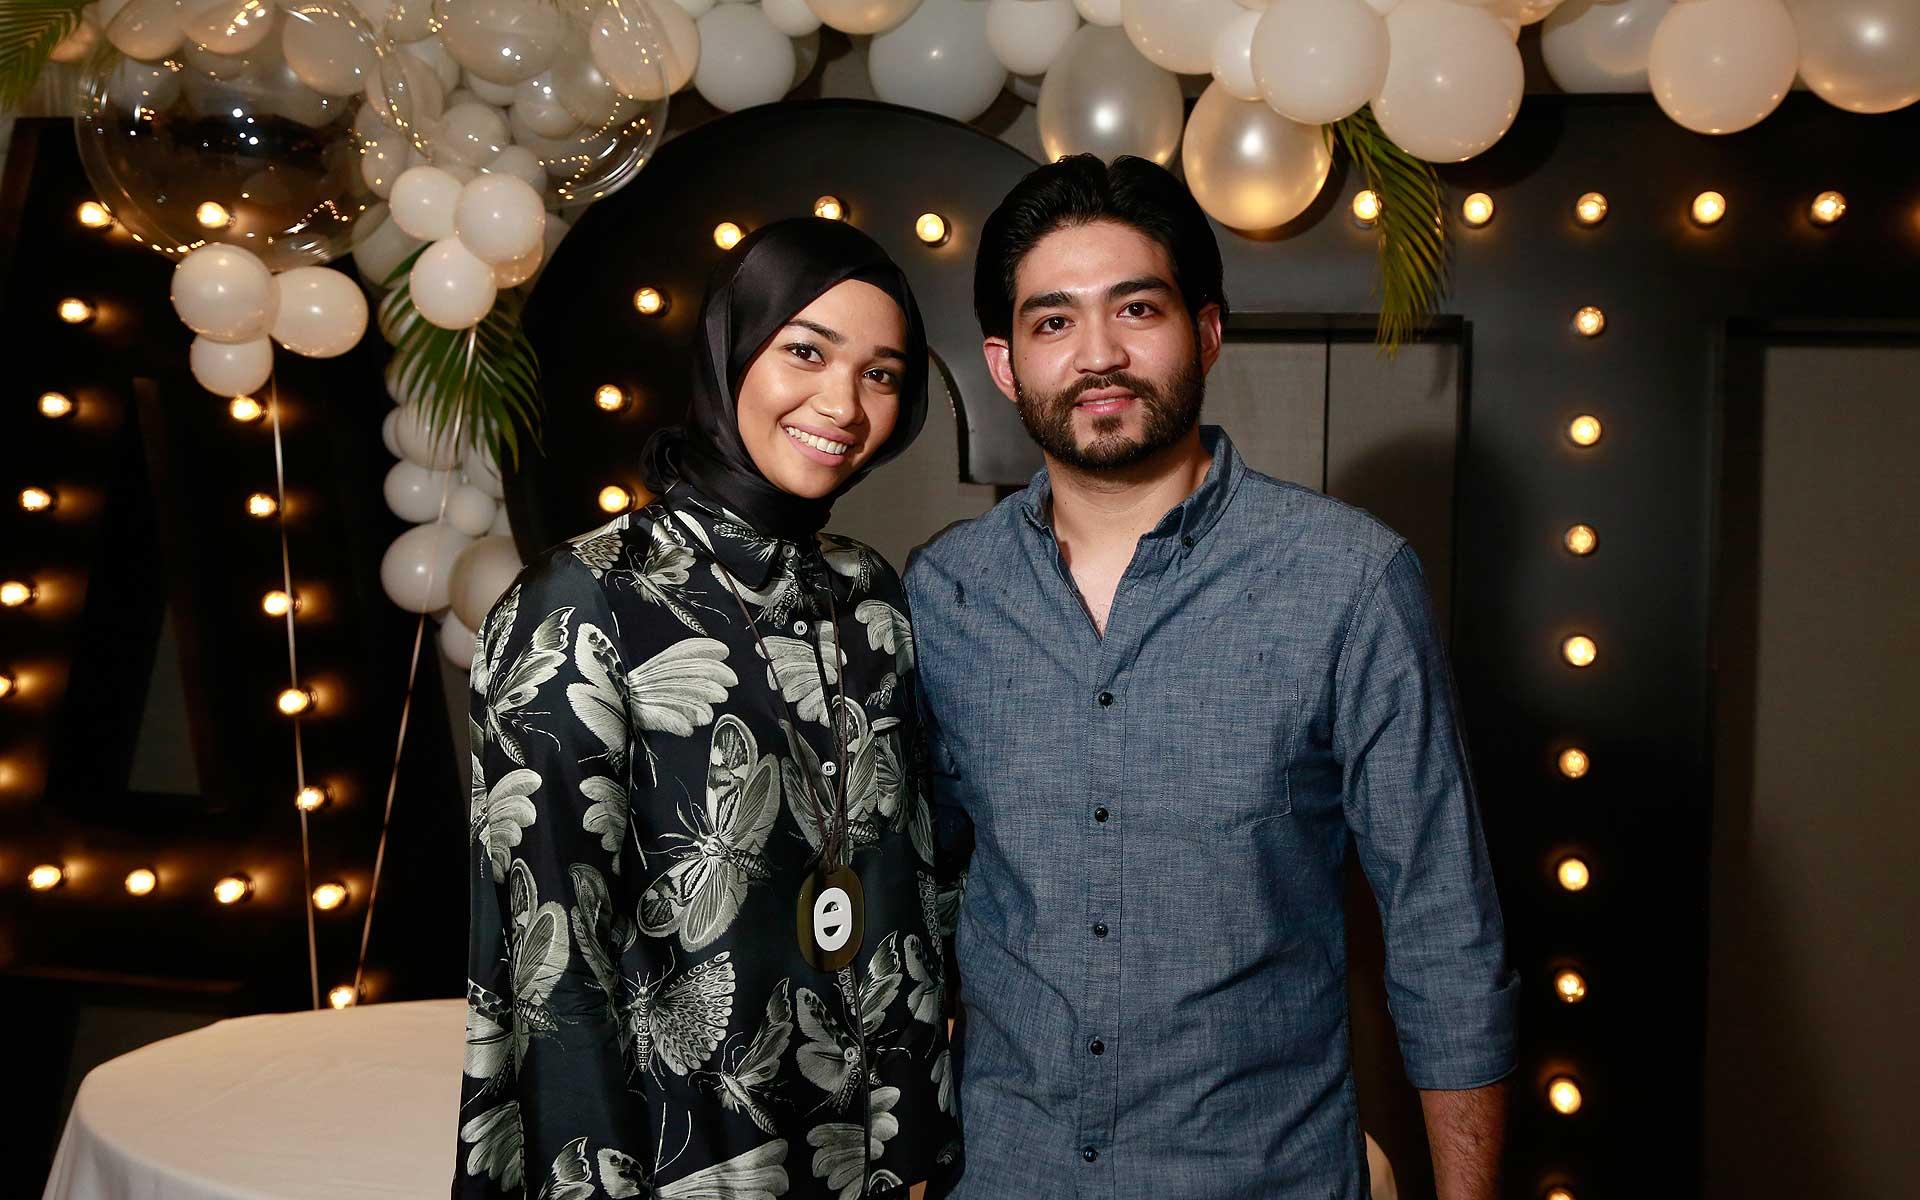 Alyssa Hisham and Muhammad Anas Zawawi